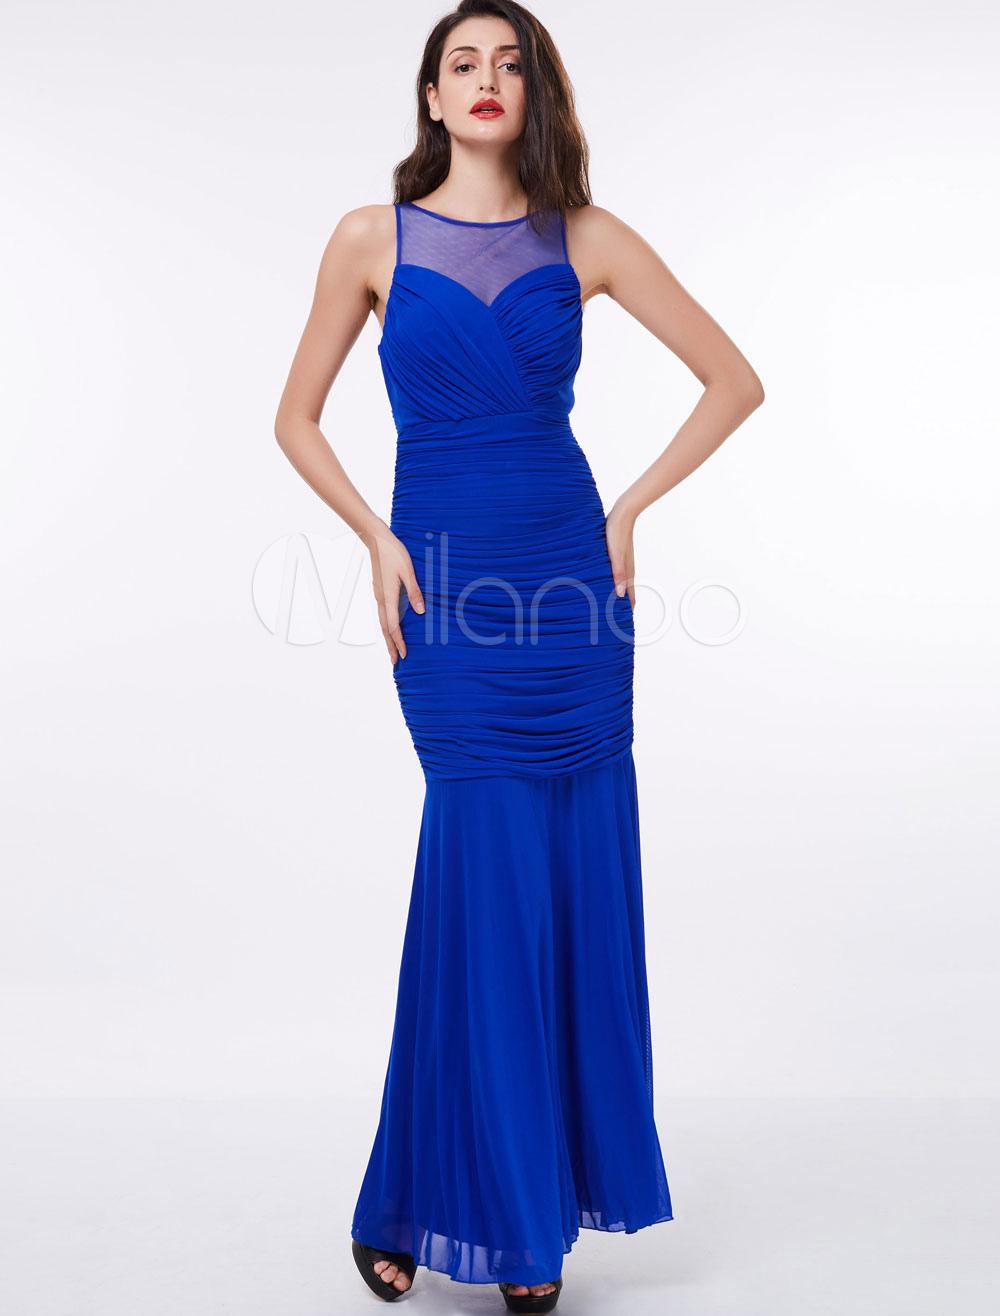 Abendkleider royal blue mermaid chiffon abendkleid geraffte sleeveless illusion bodenlangen - Milanoo abendkleider ...